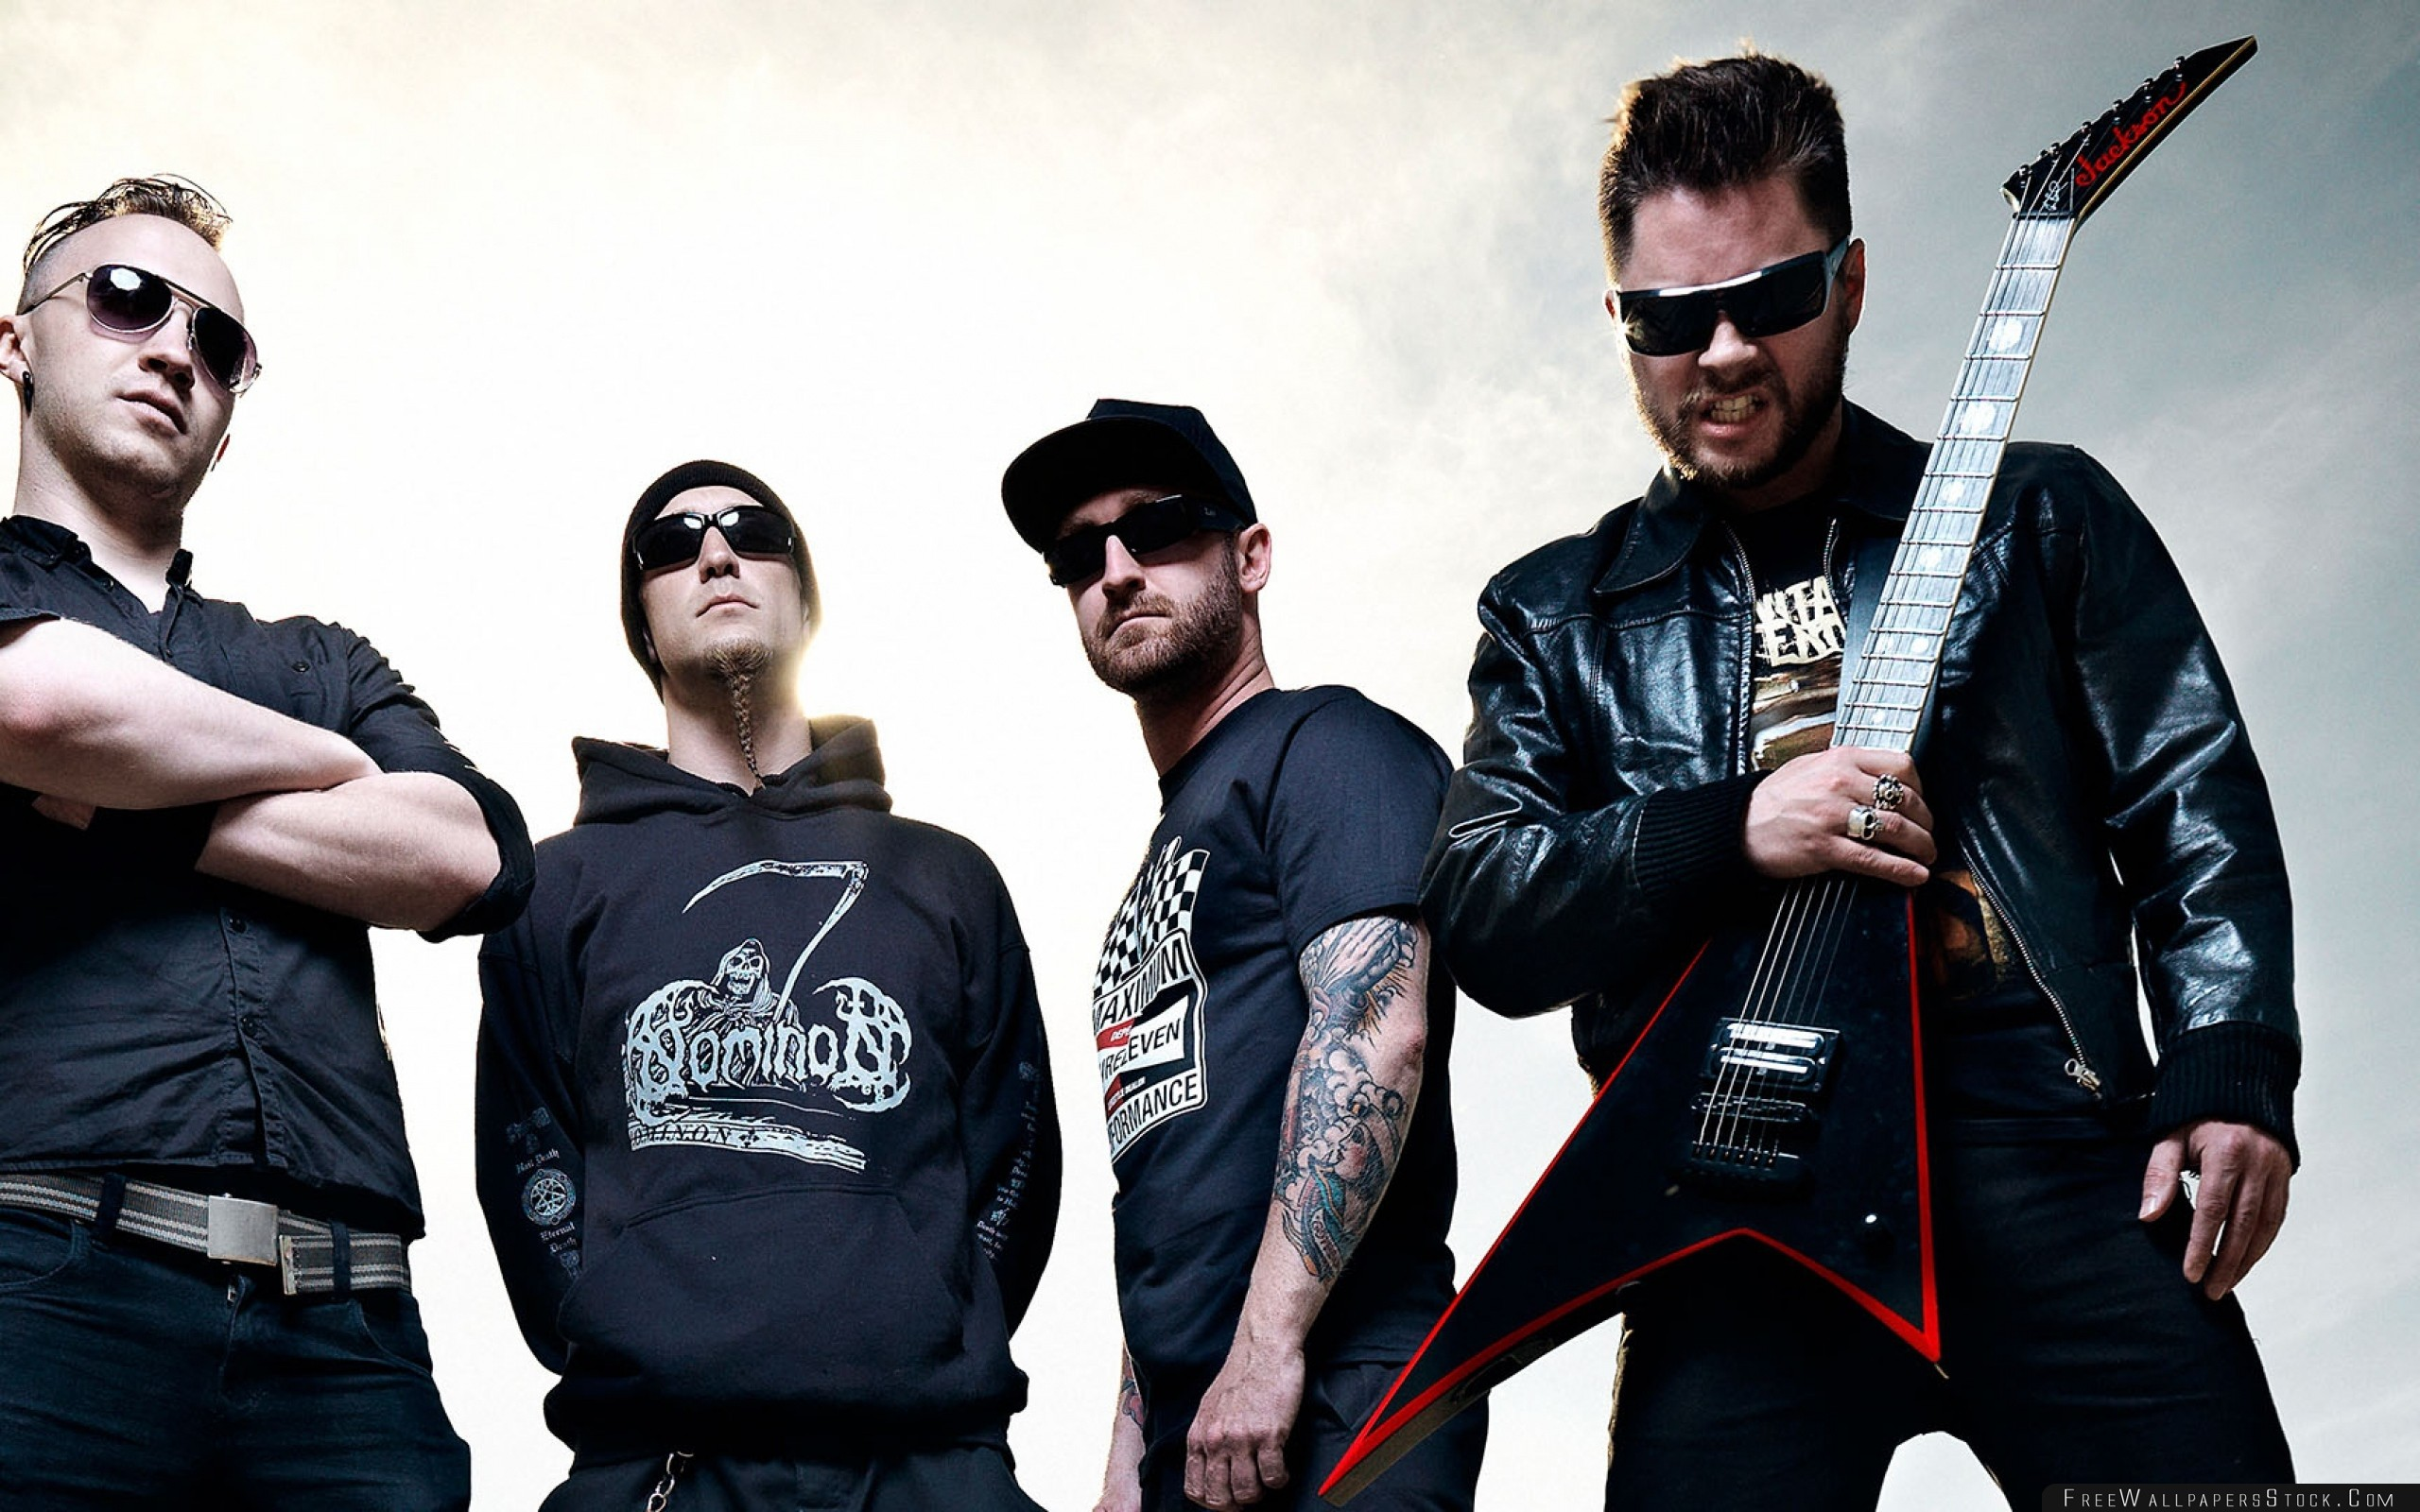 Download Free Wallpaper Zombiekrig Guitar Glasses Tattoo Sky